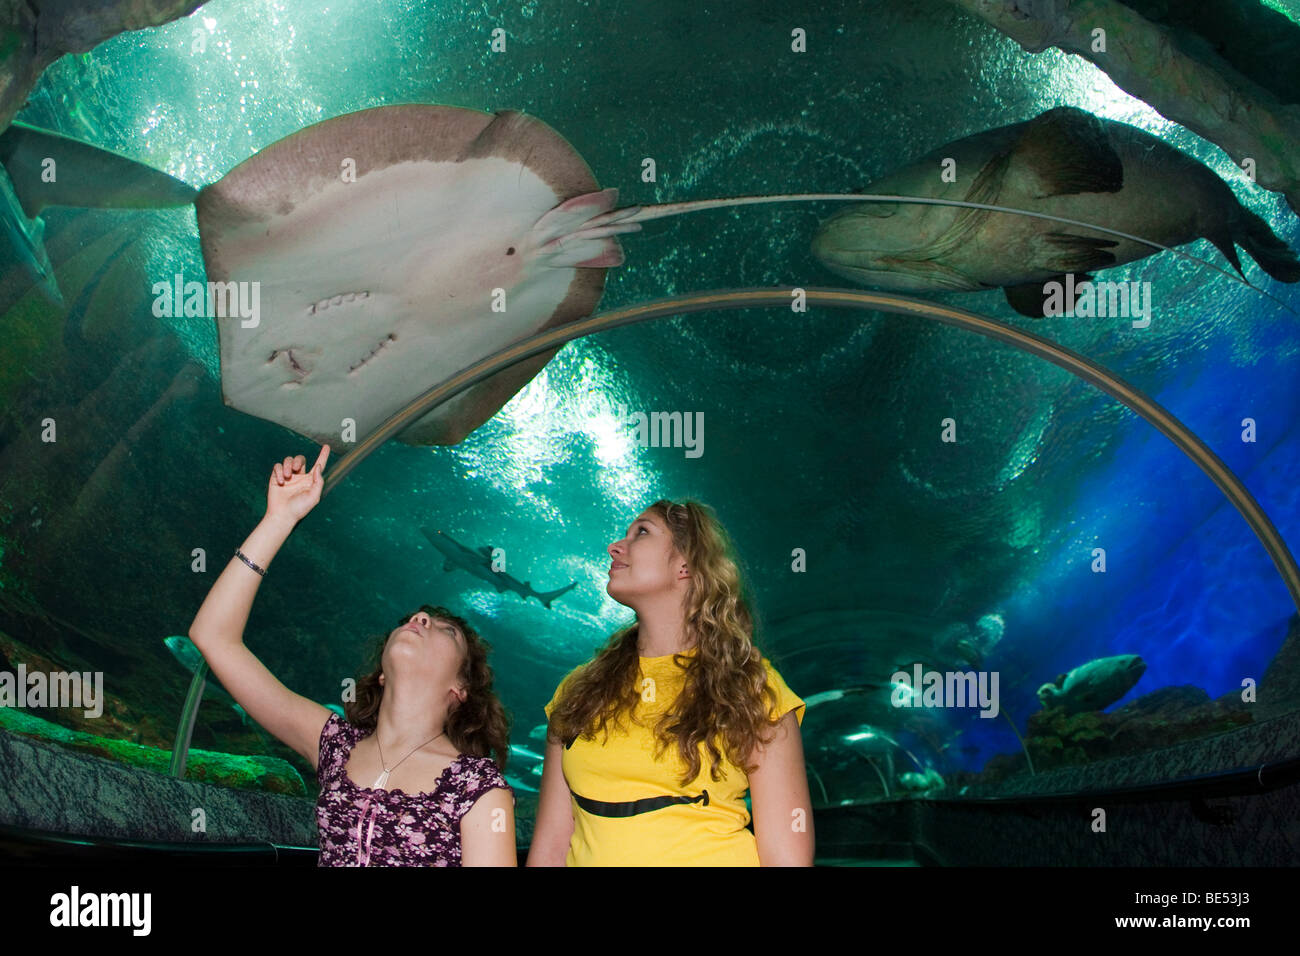 Fish aquarium in sentosa - Stock Photo Young People Watching Fish In An Aquarium Sentosa Amusement Park Singapore Southeast Asia